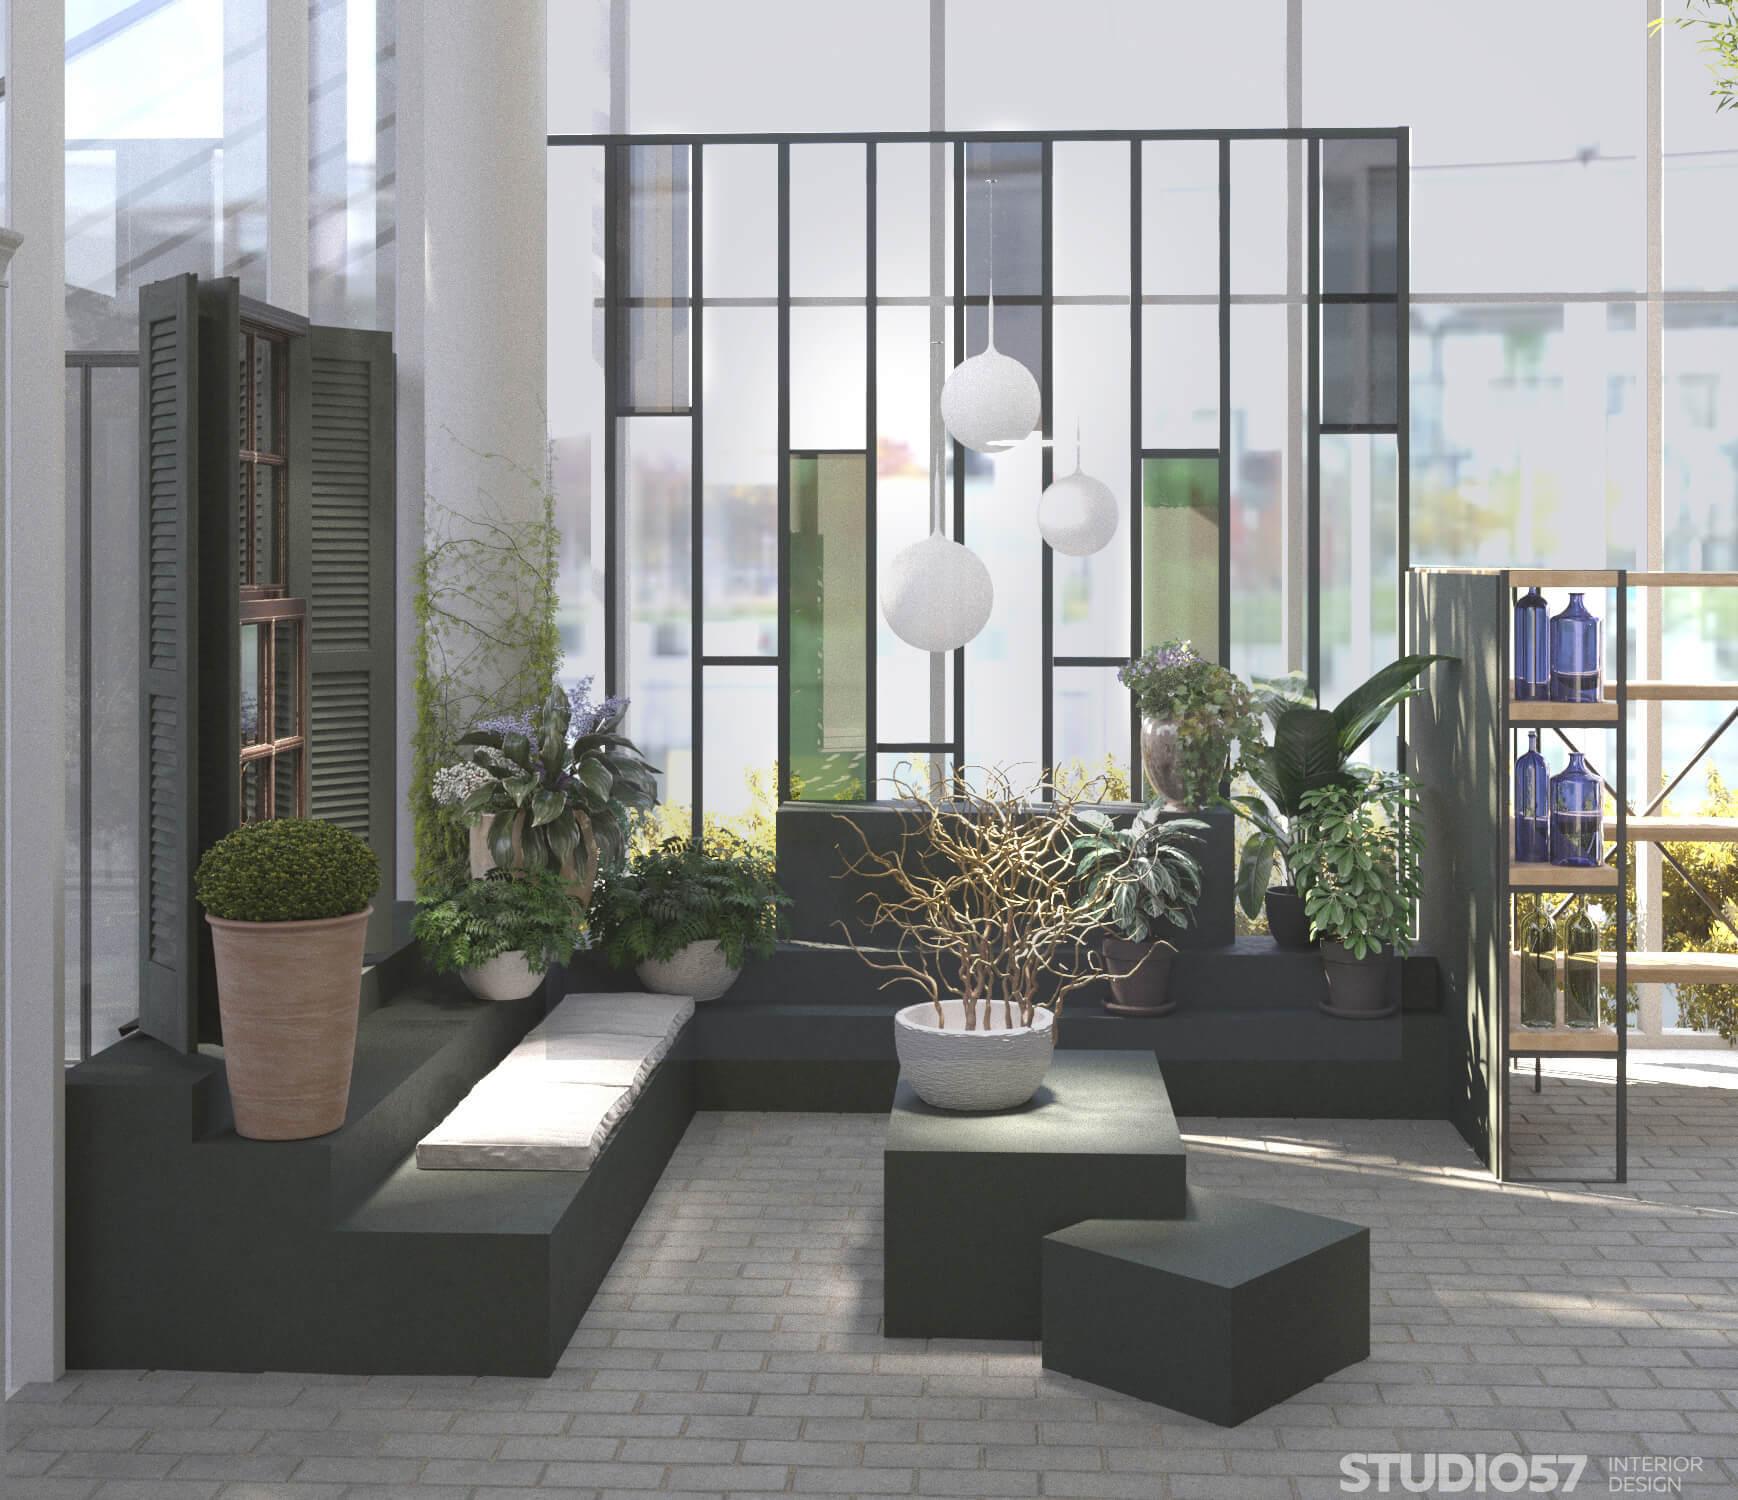 Store zoning